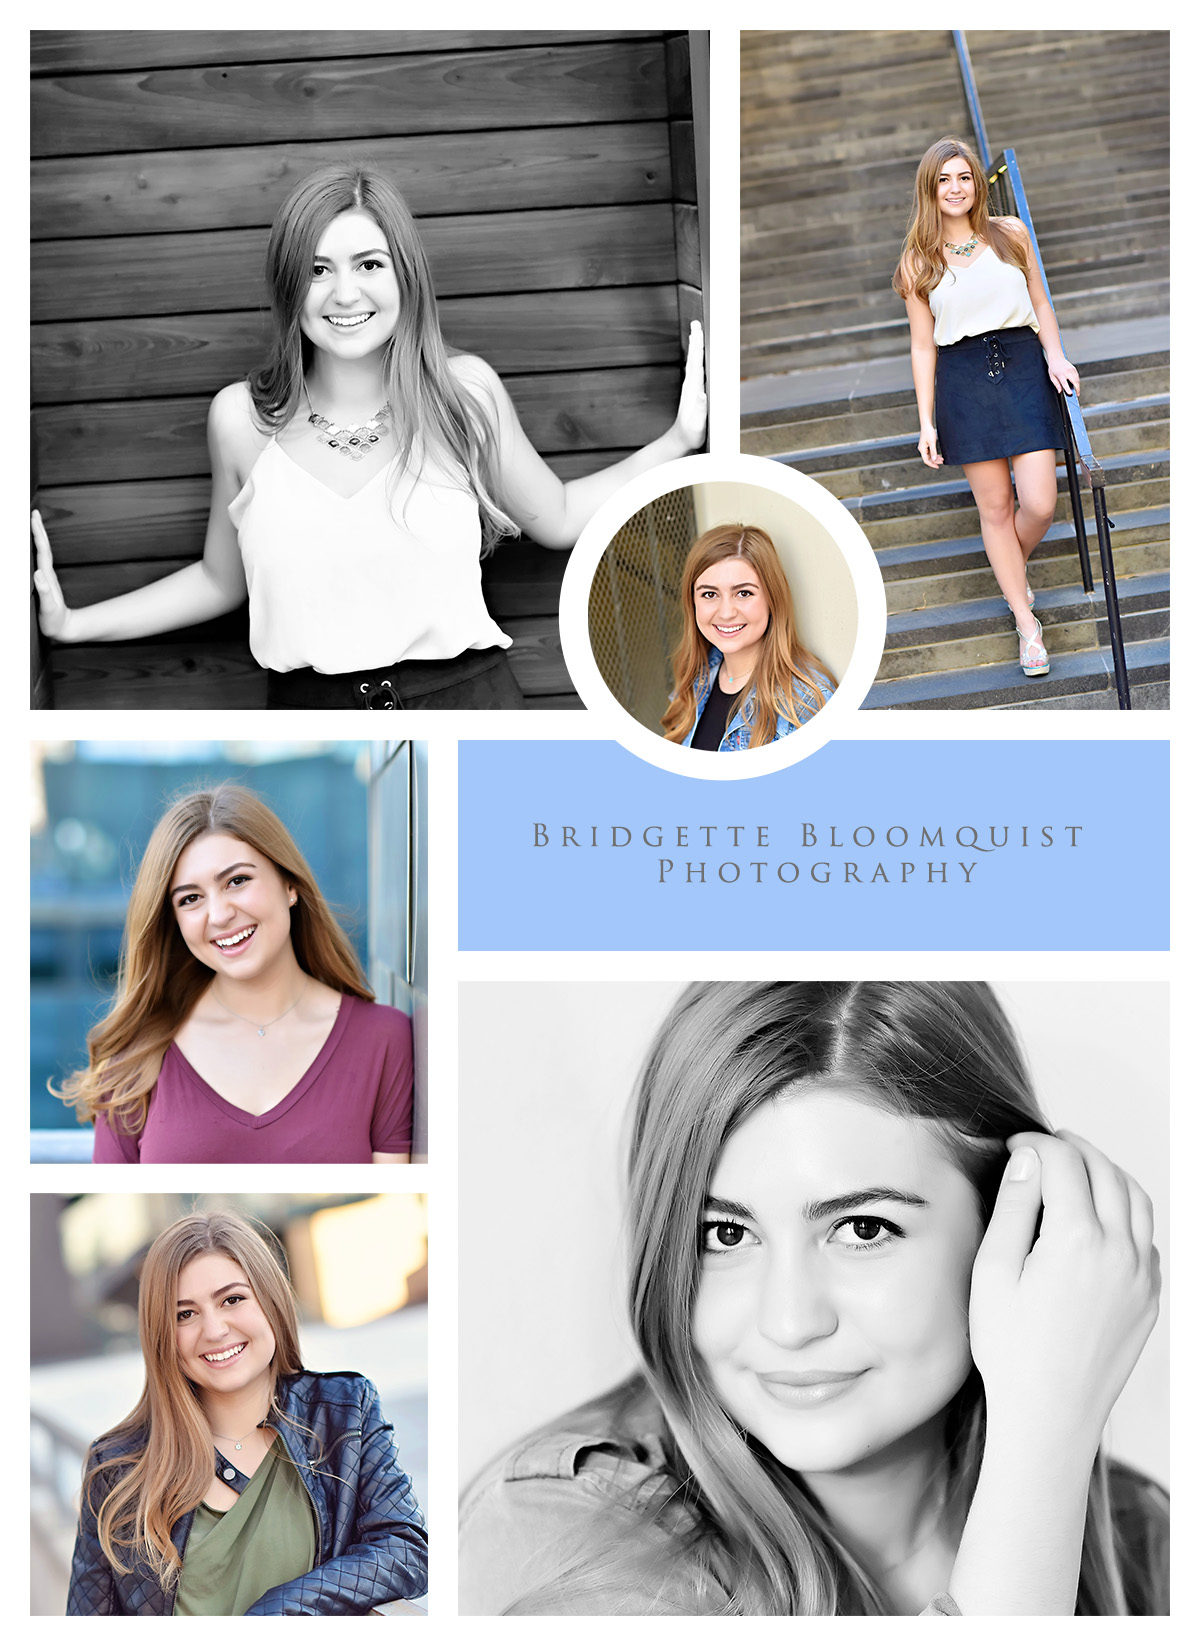 Bridgette Bloomquist Photography